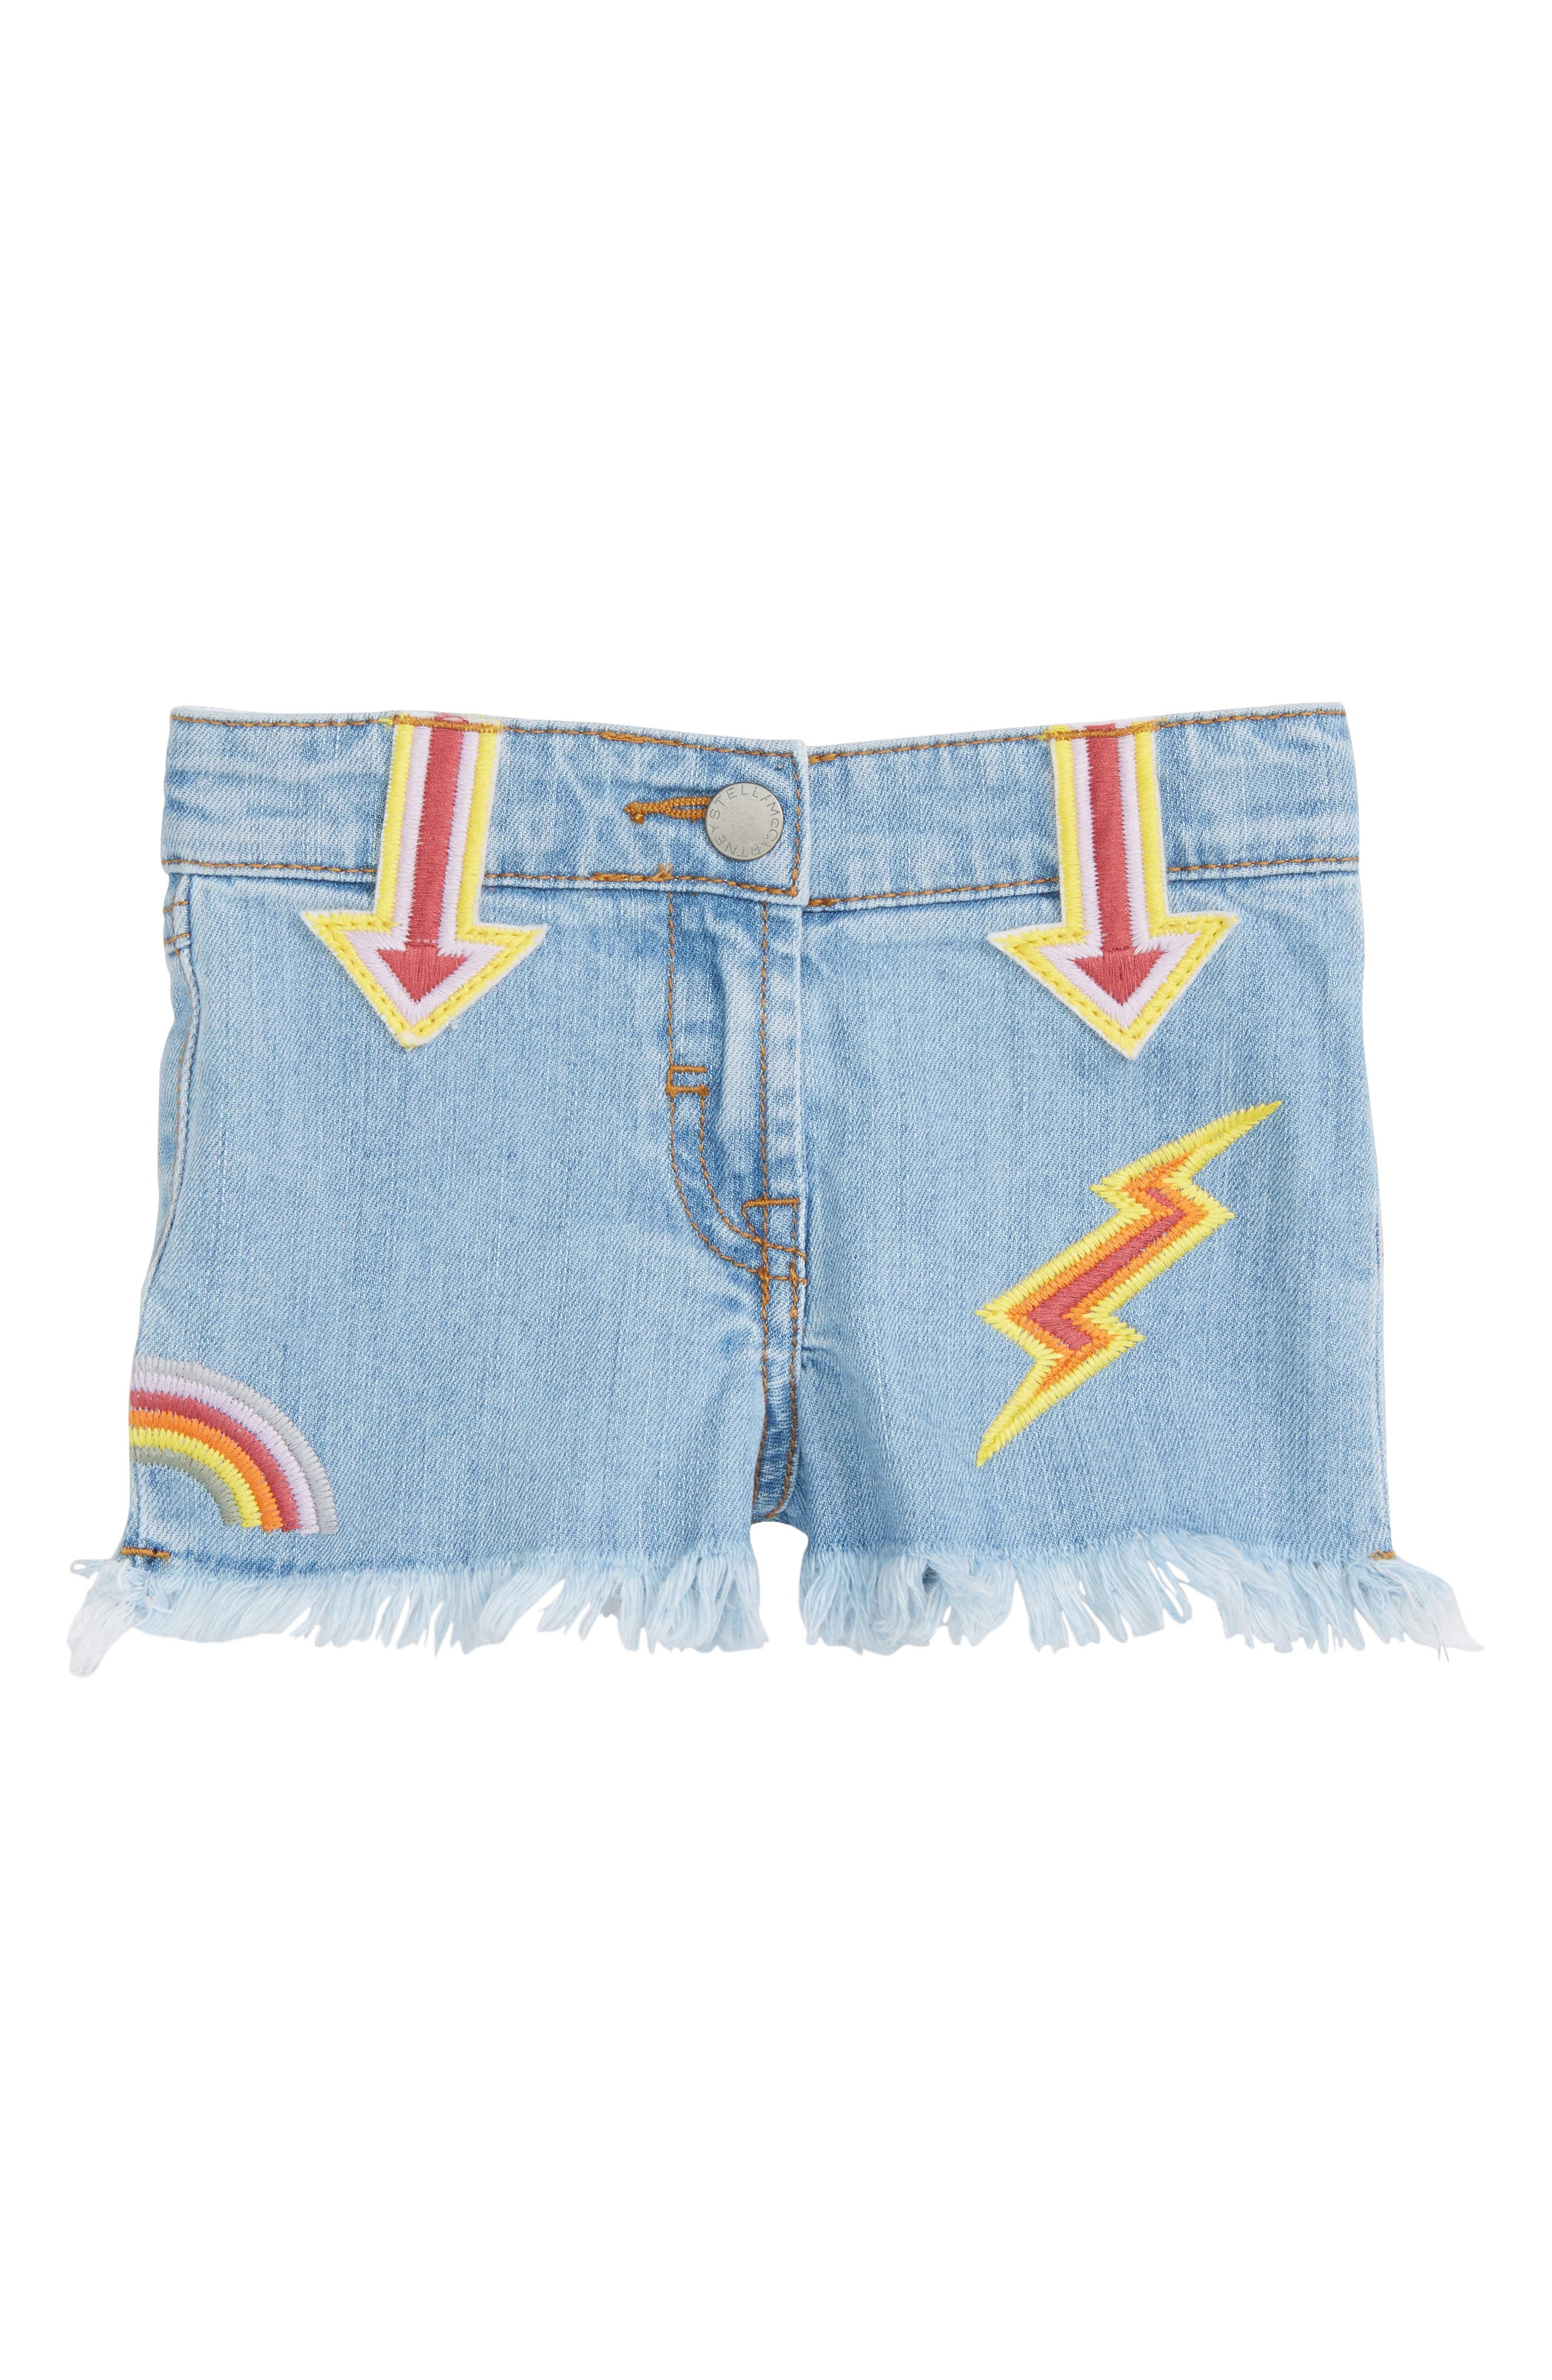 Kids Marlin Patched Cutoff Denim Shorts,                             Main thumbnail 1, color,                             Denim